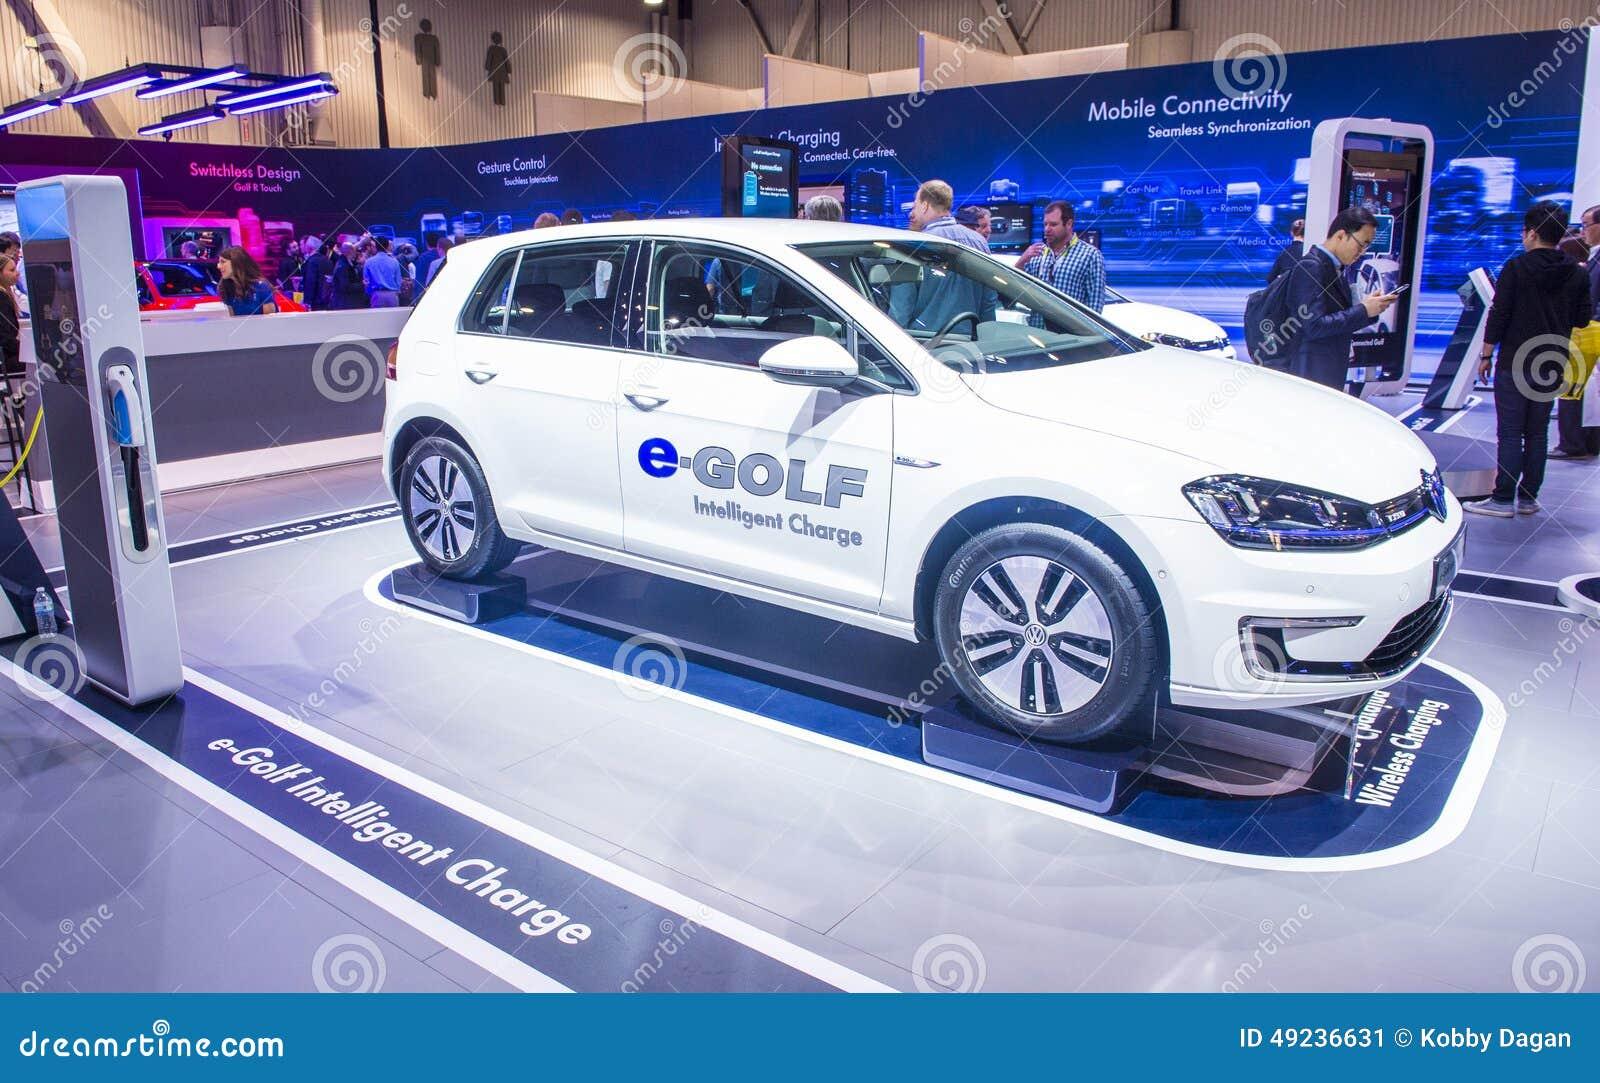 Volkswagen Of America Car Show Support